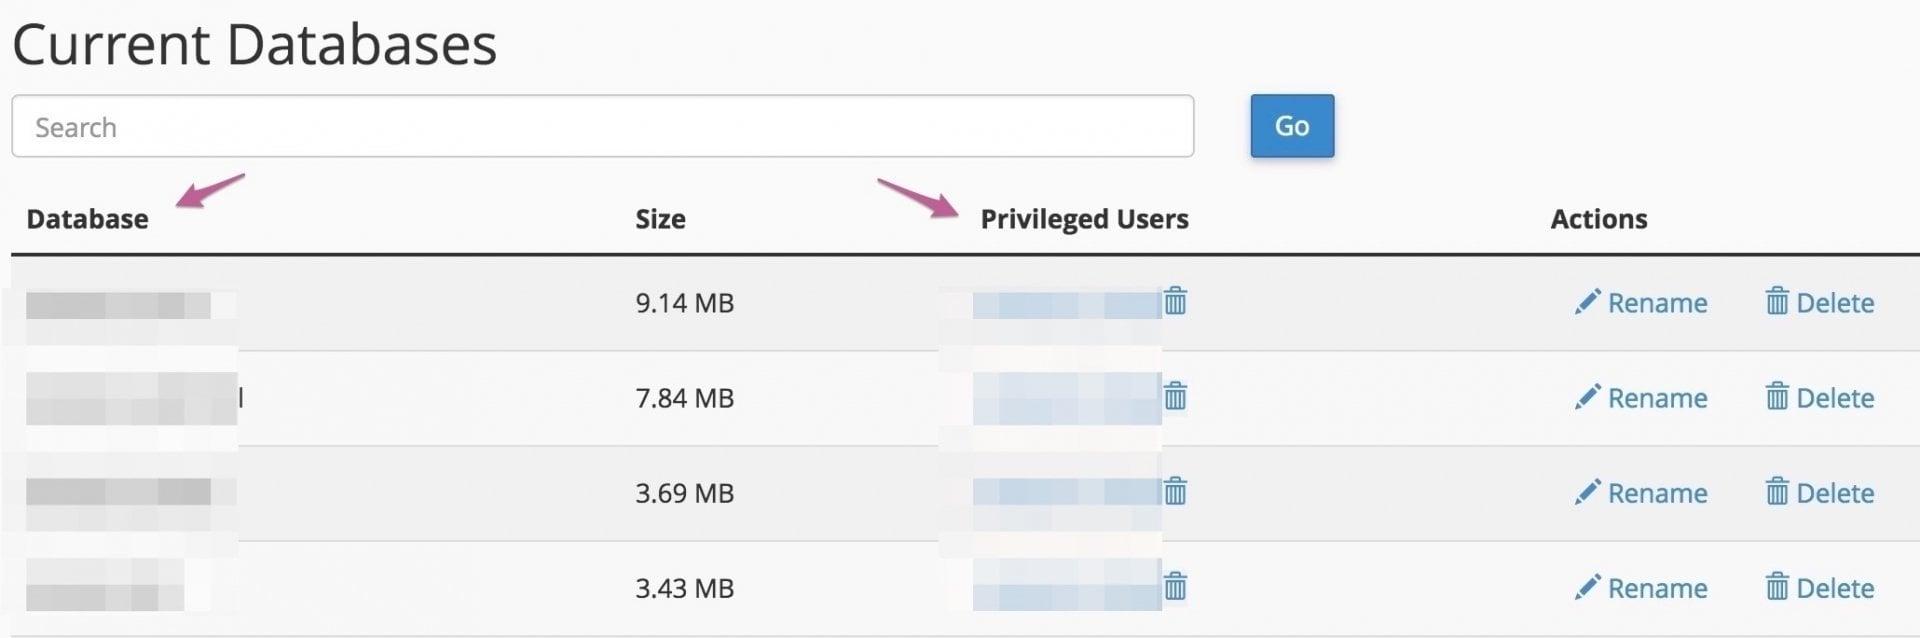 Check current MySQL Databases - WordPress